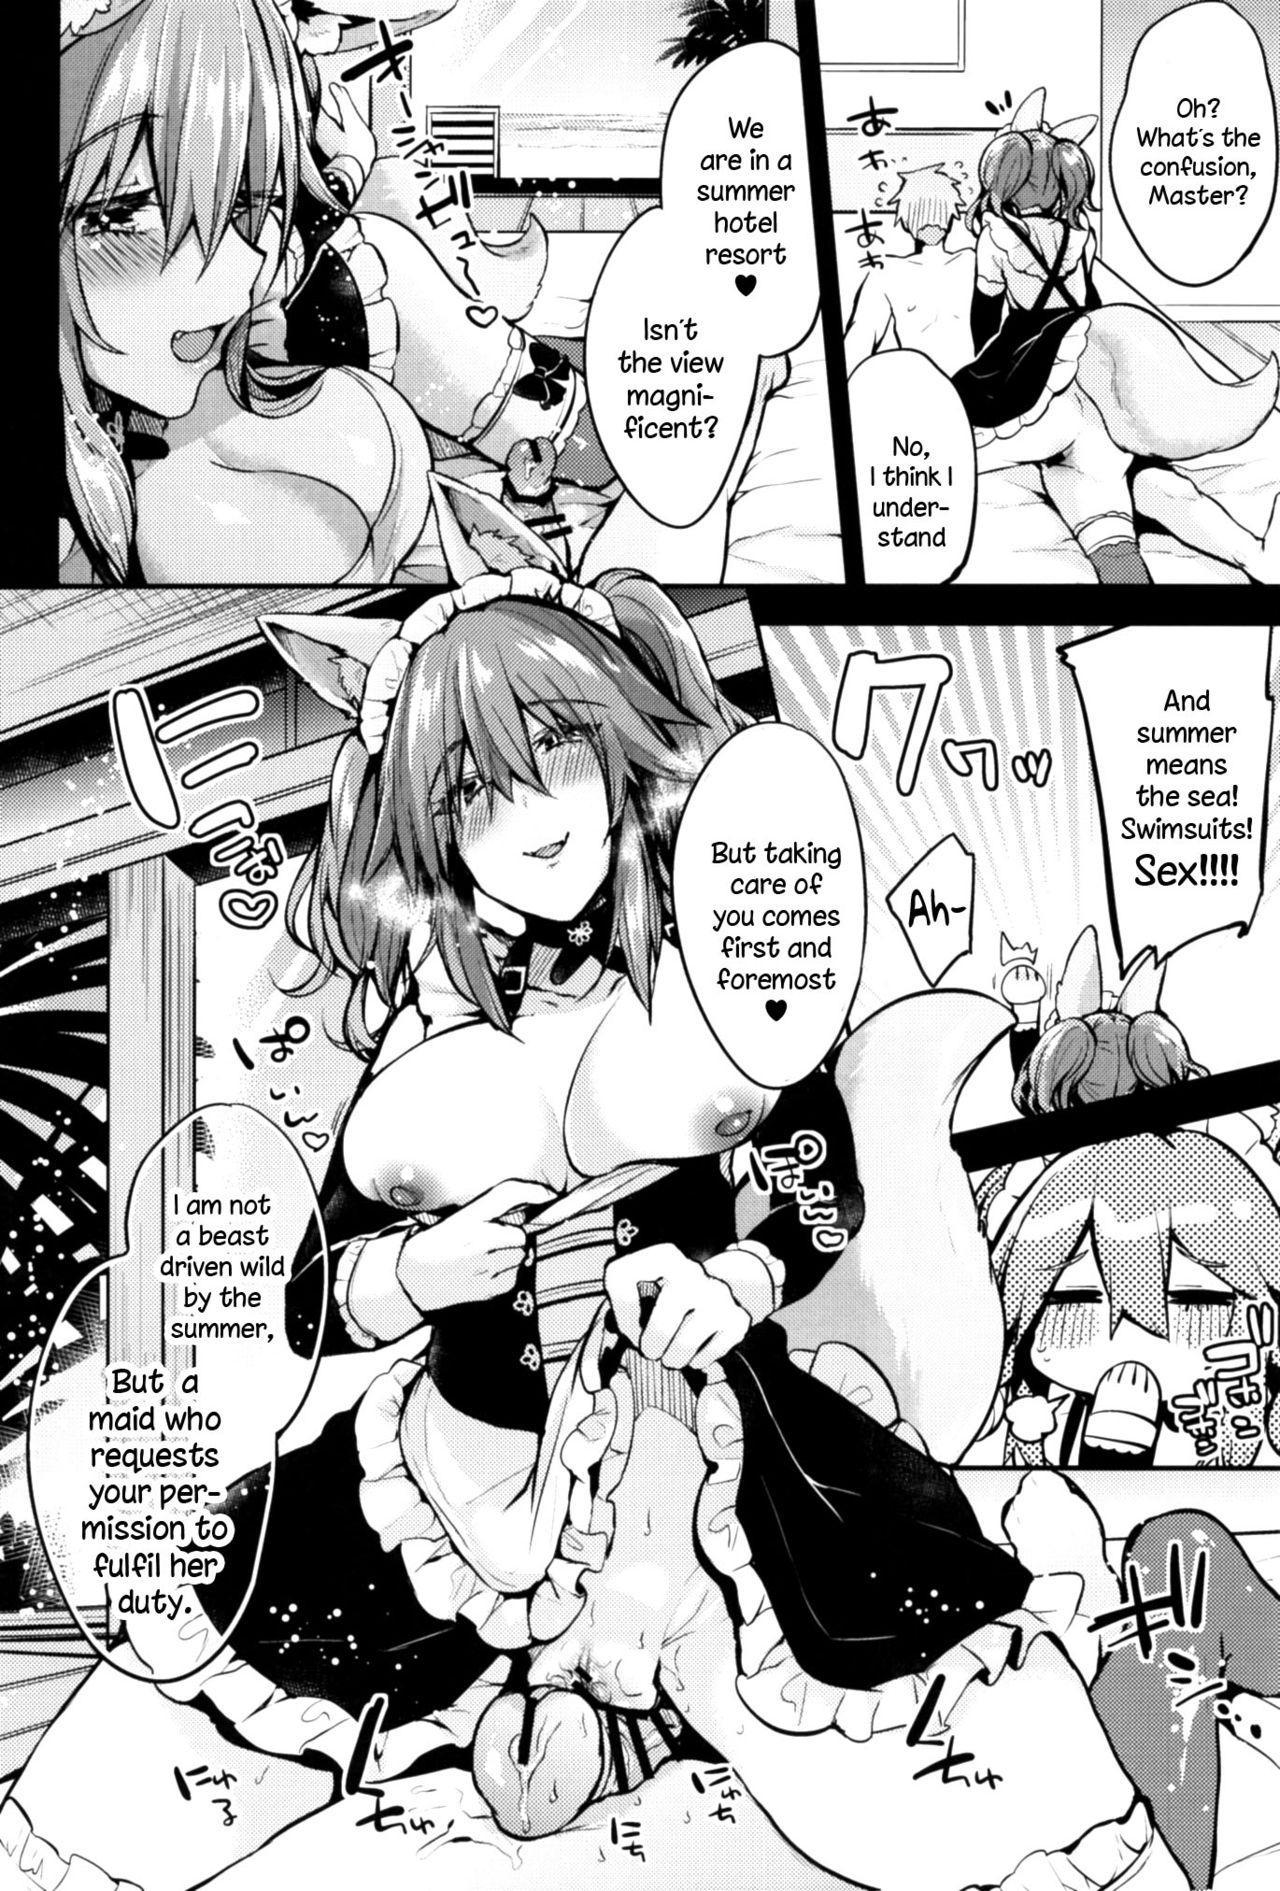 Maid Service Double Fox 3